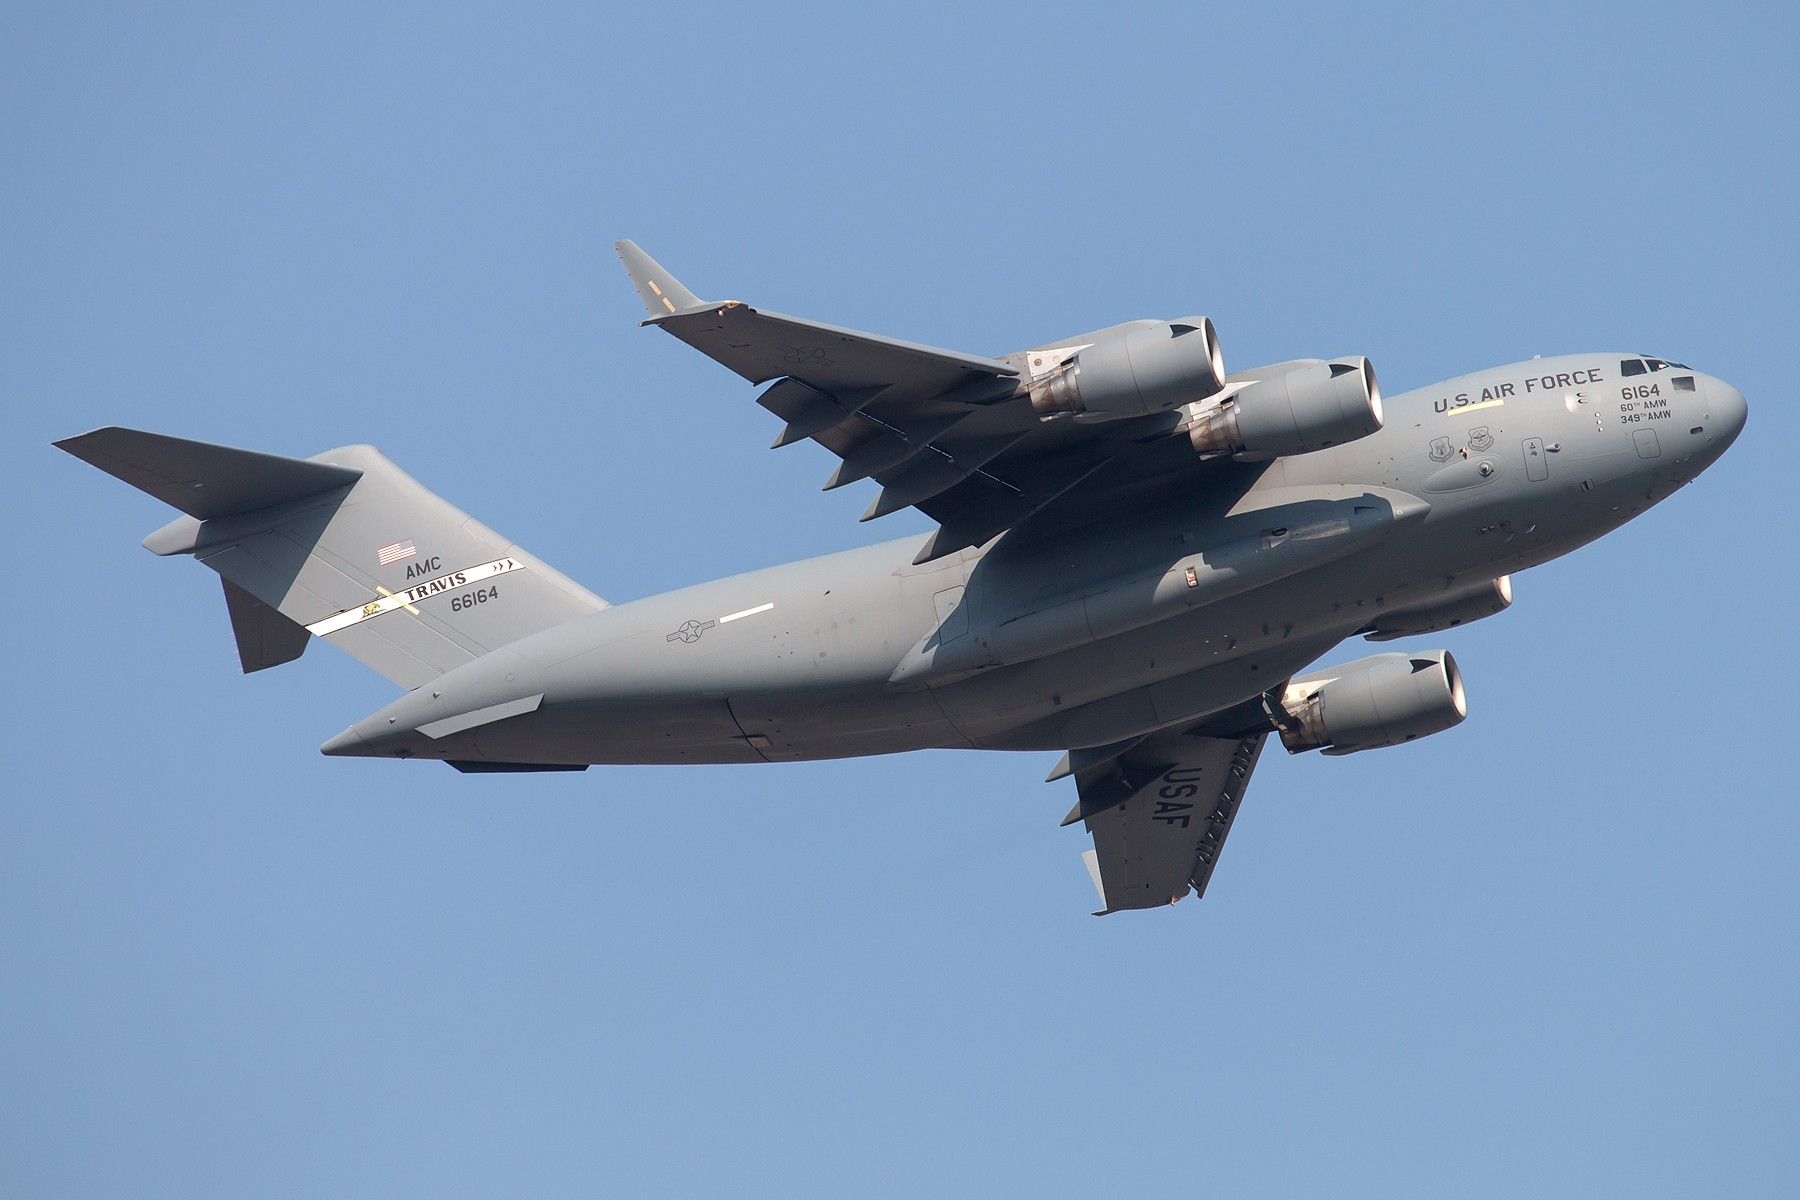 Re:[原创]C17 1800*1200 BOEING C-17A GLOBEMASTER III 06-6164 中国北京首都国际机场